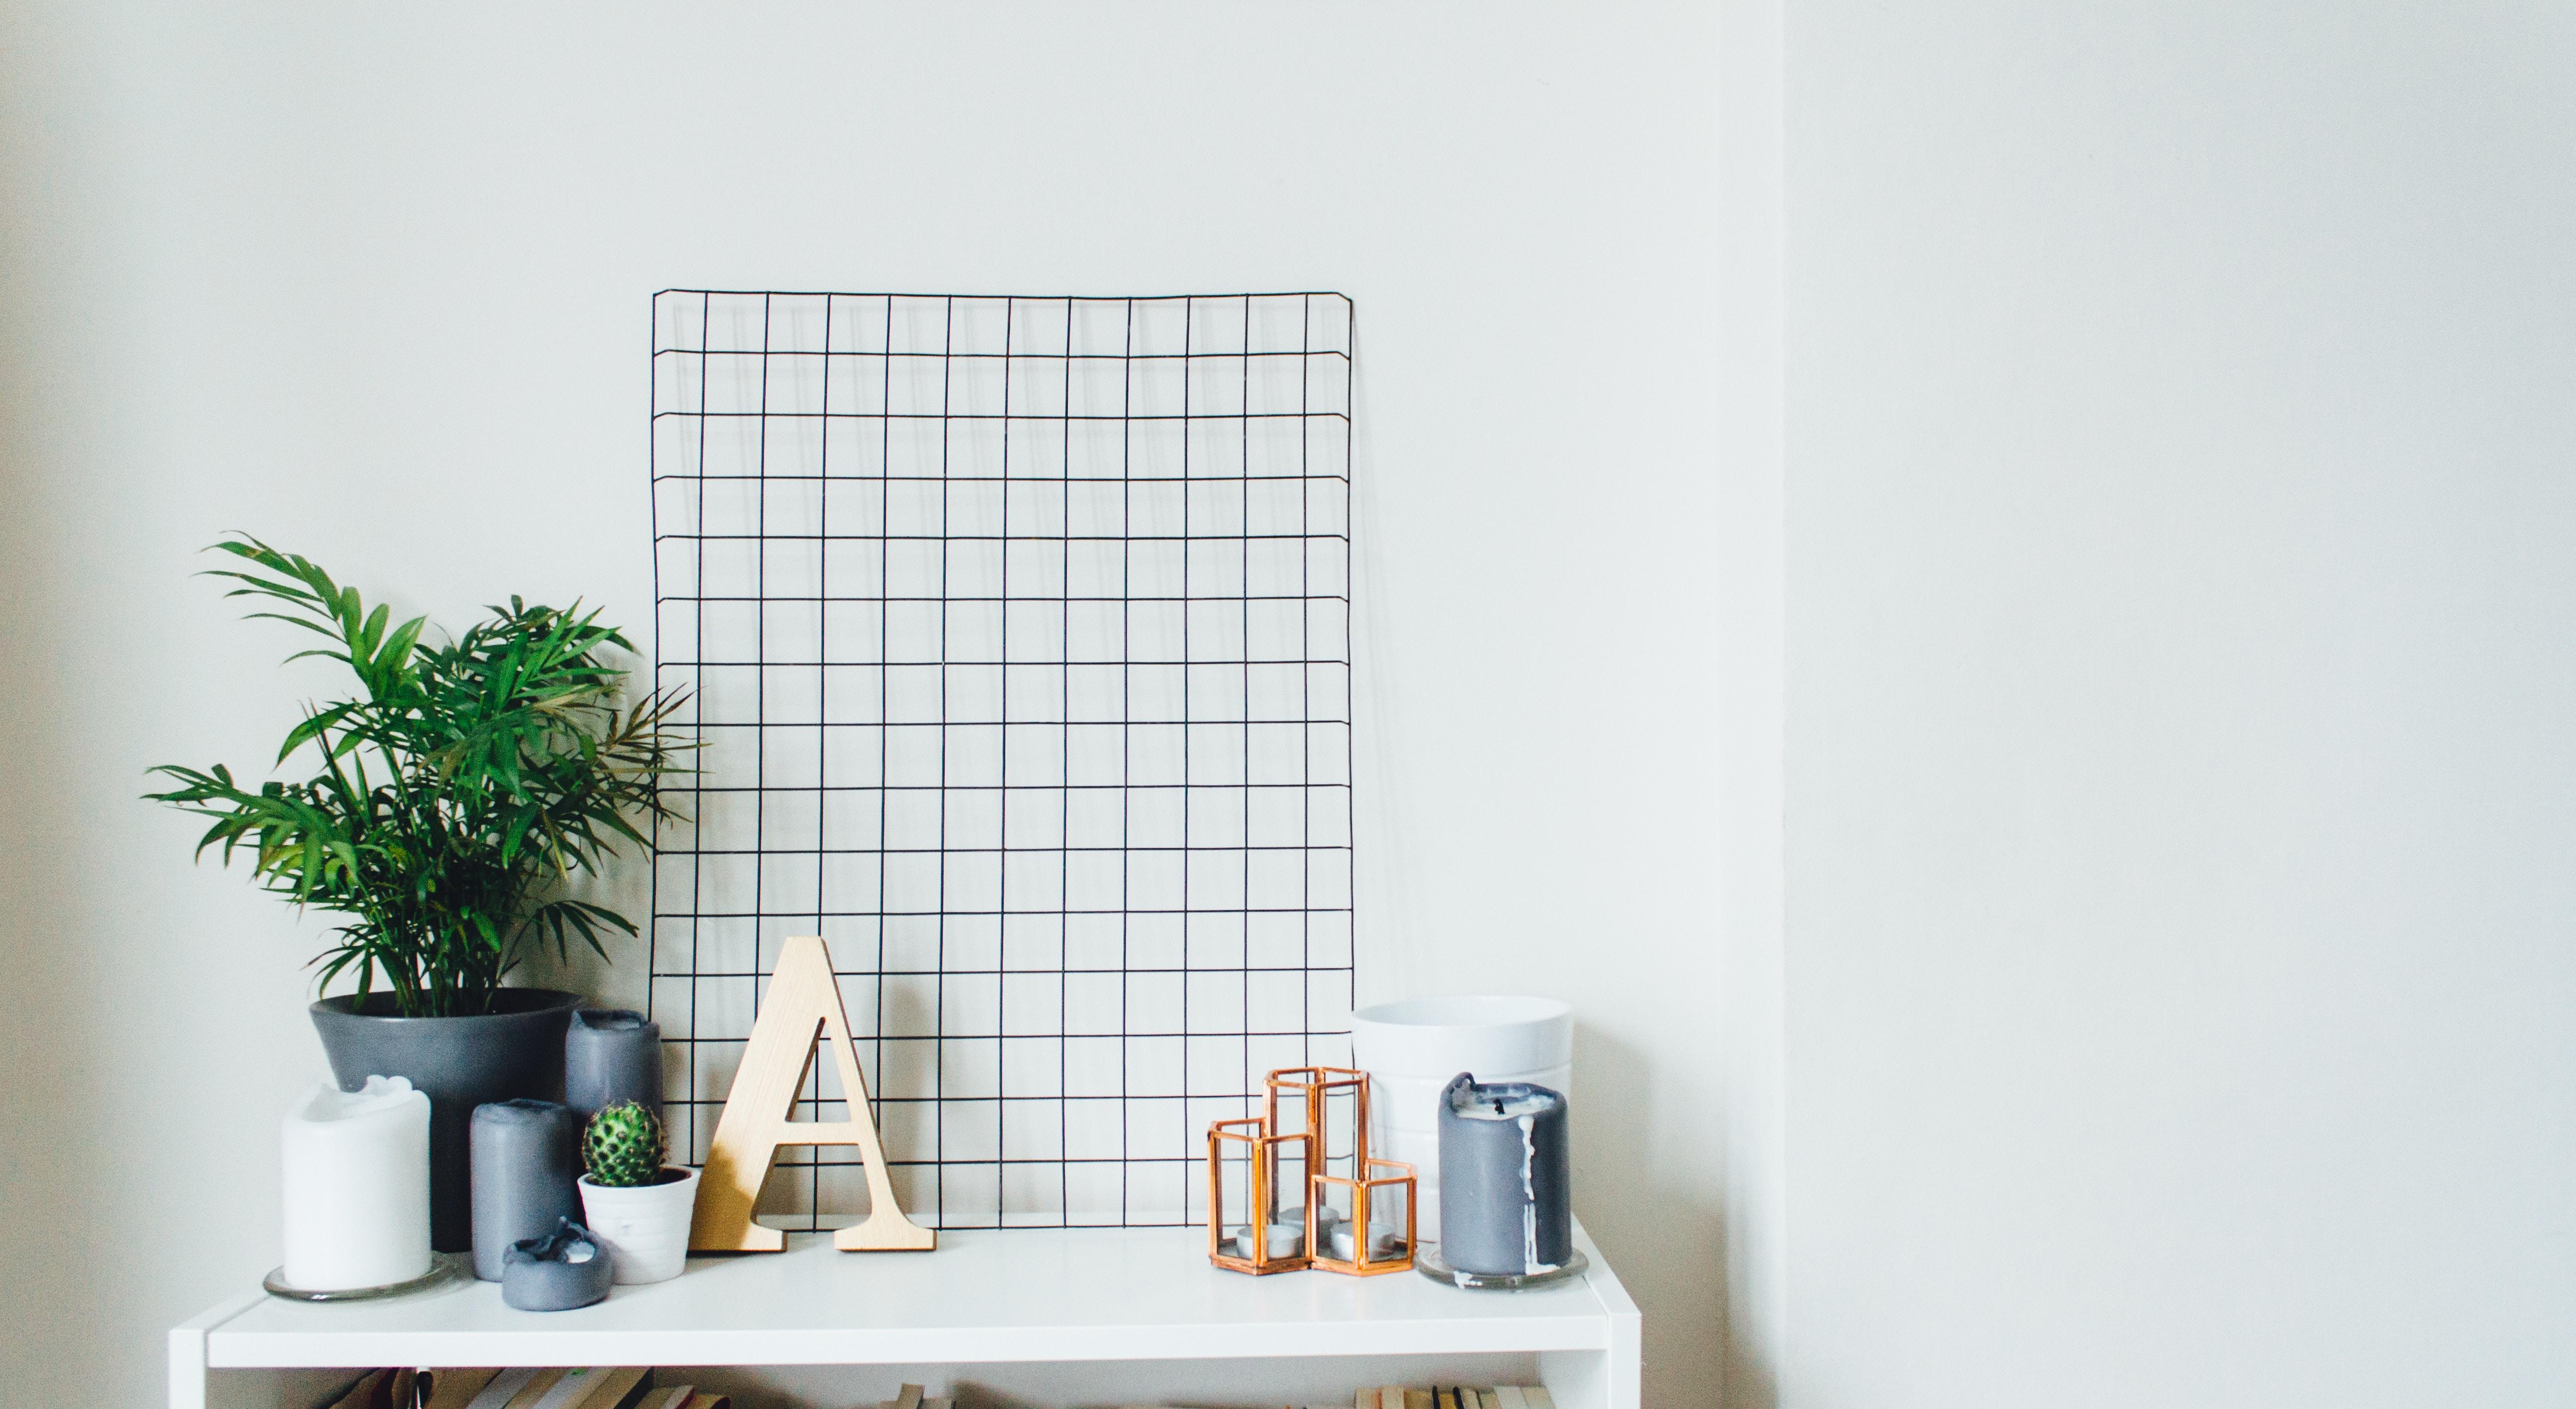 Comment rendre son appartement moderne?